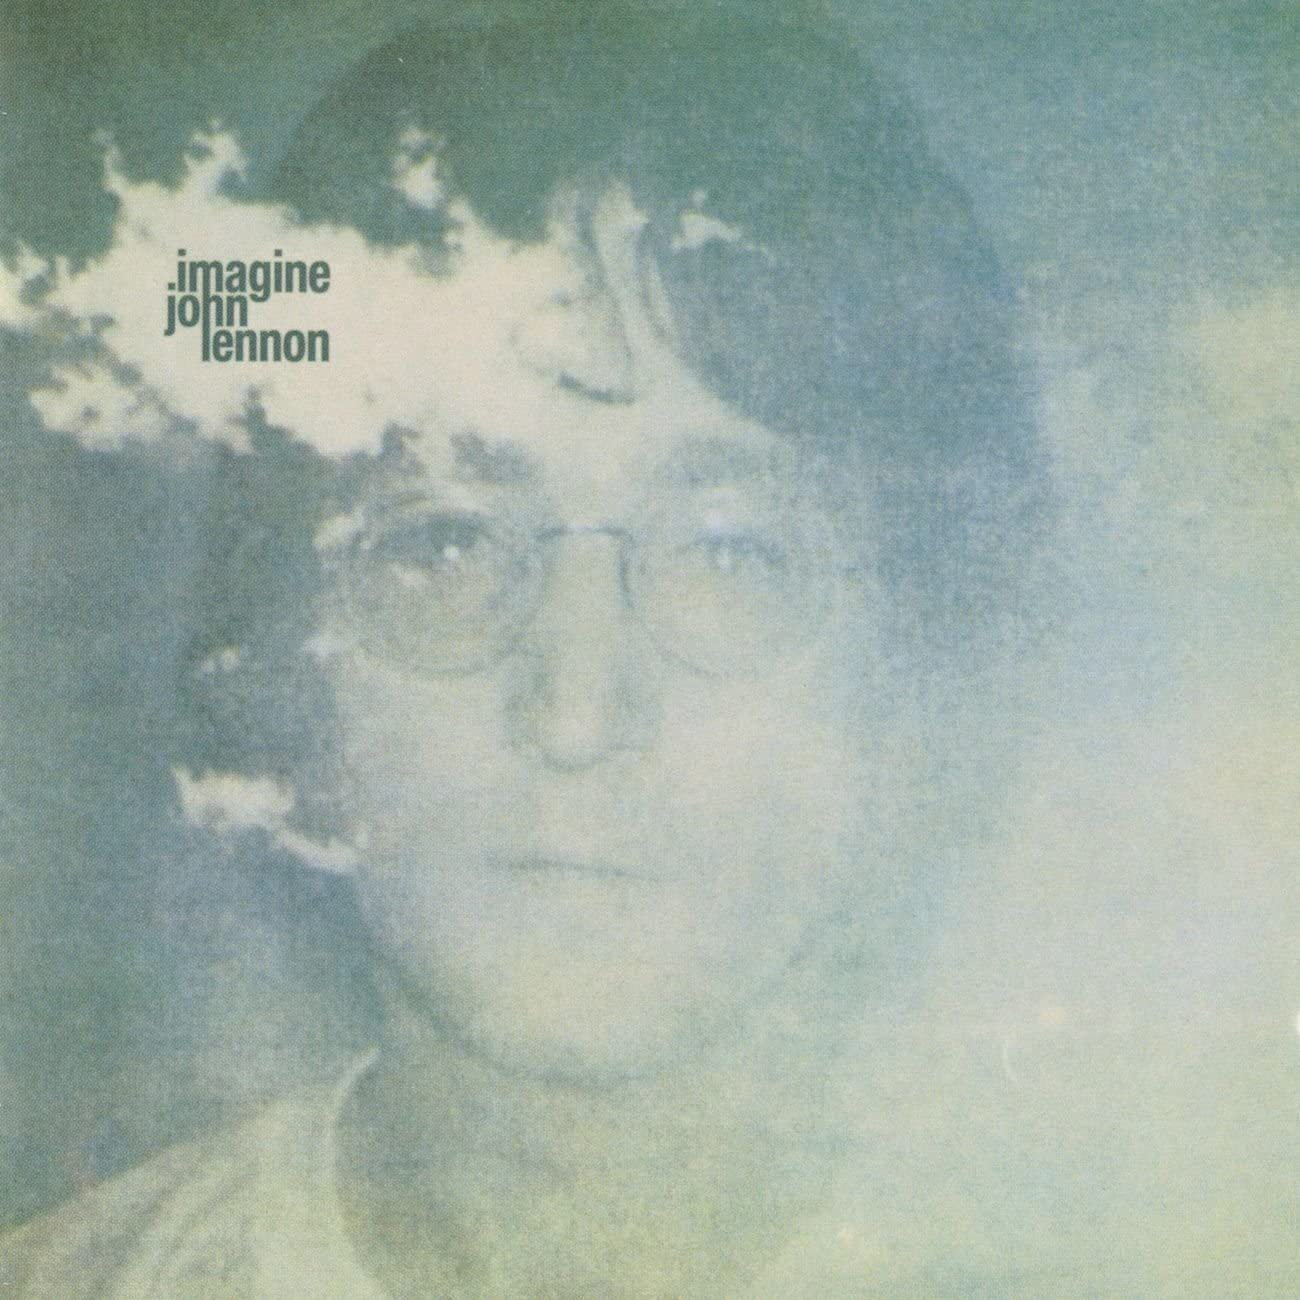 Imagine: Lennon's sugar-coated sermon to the world